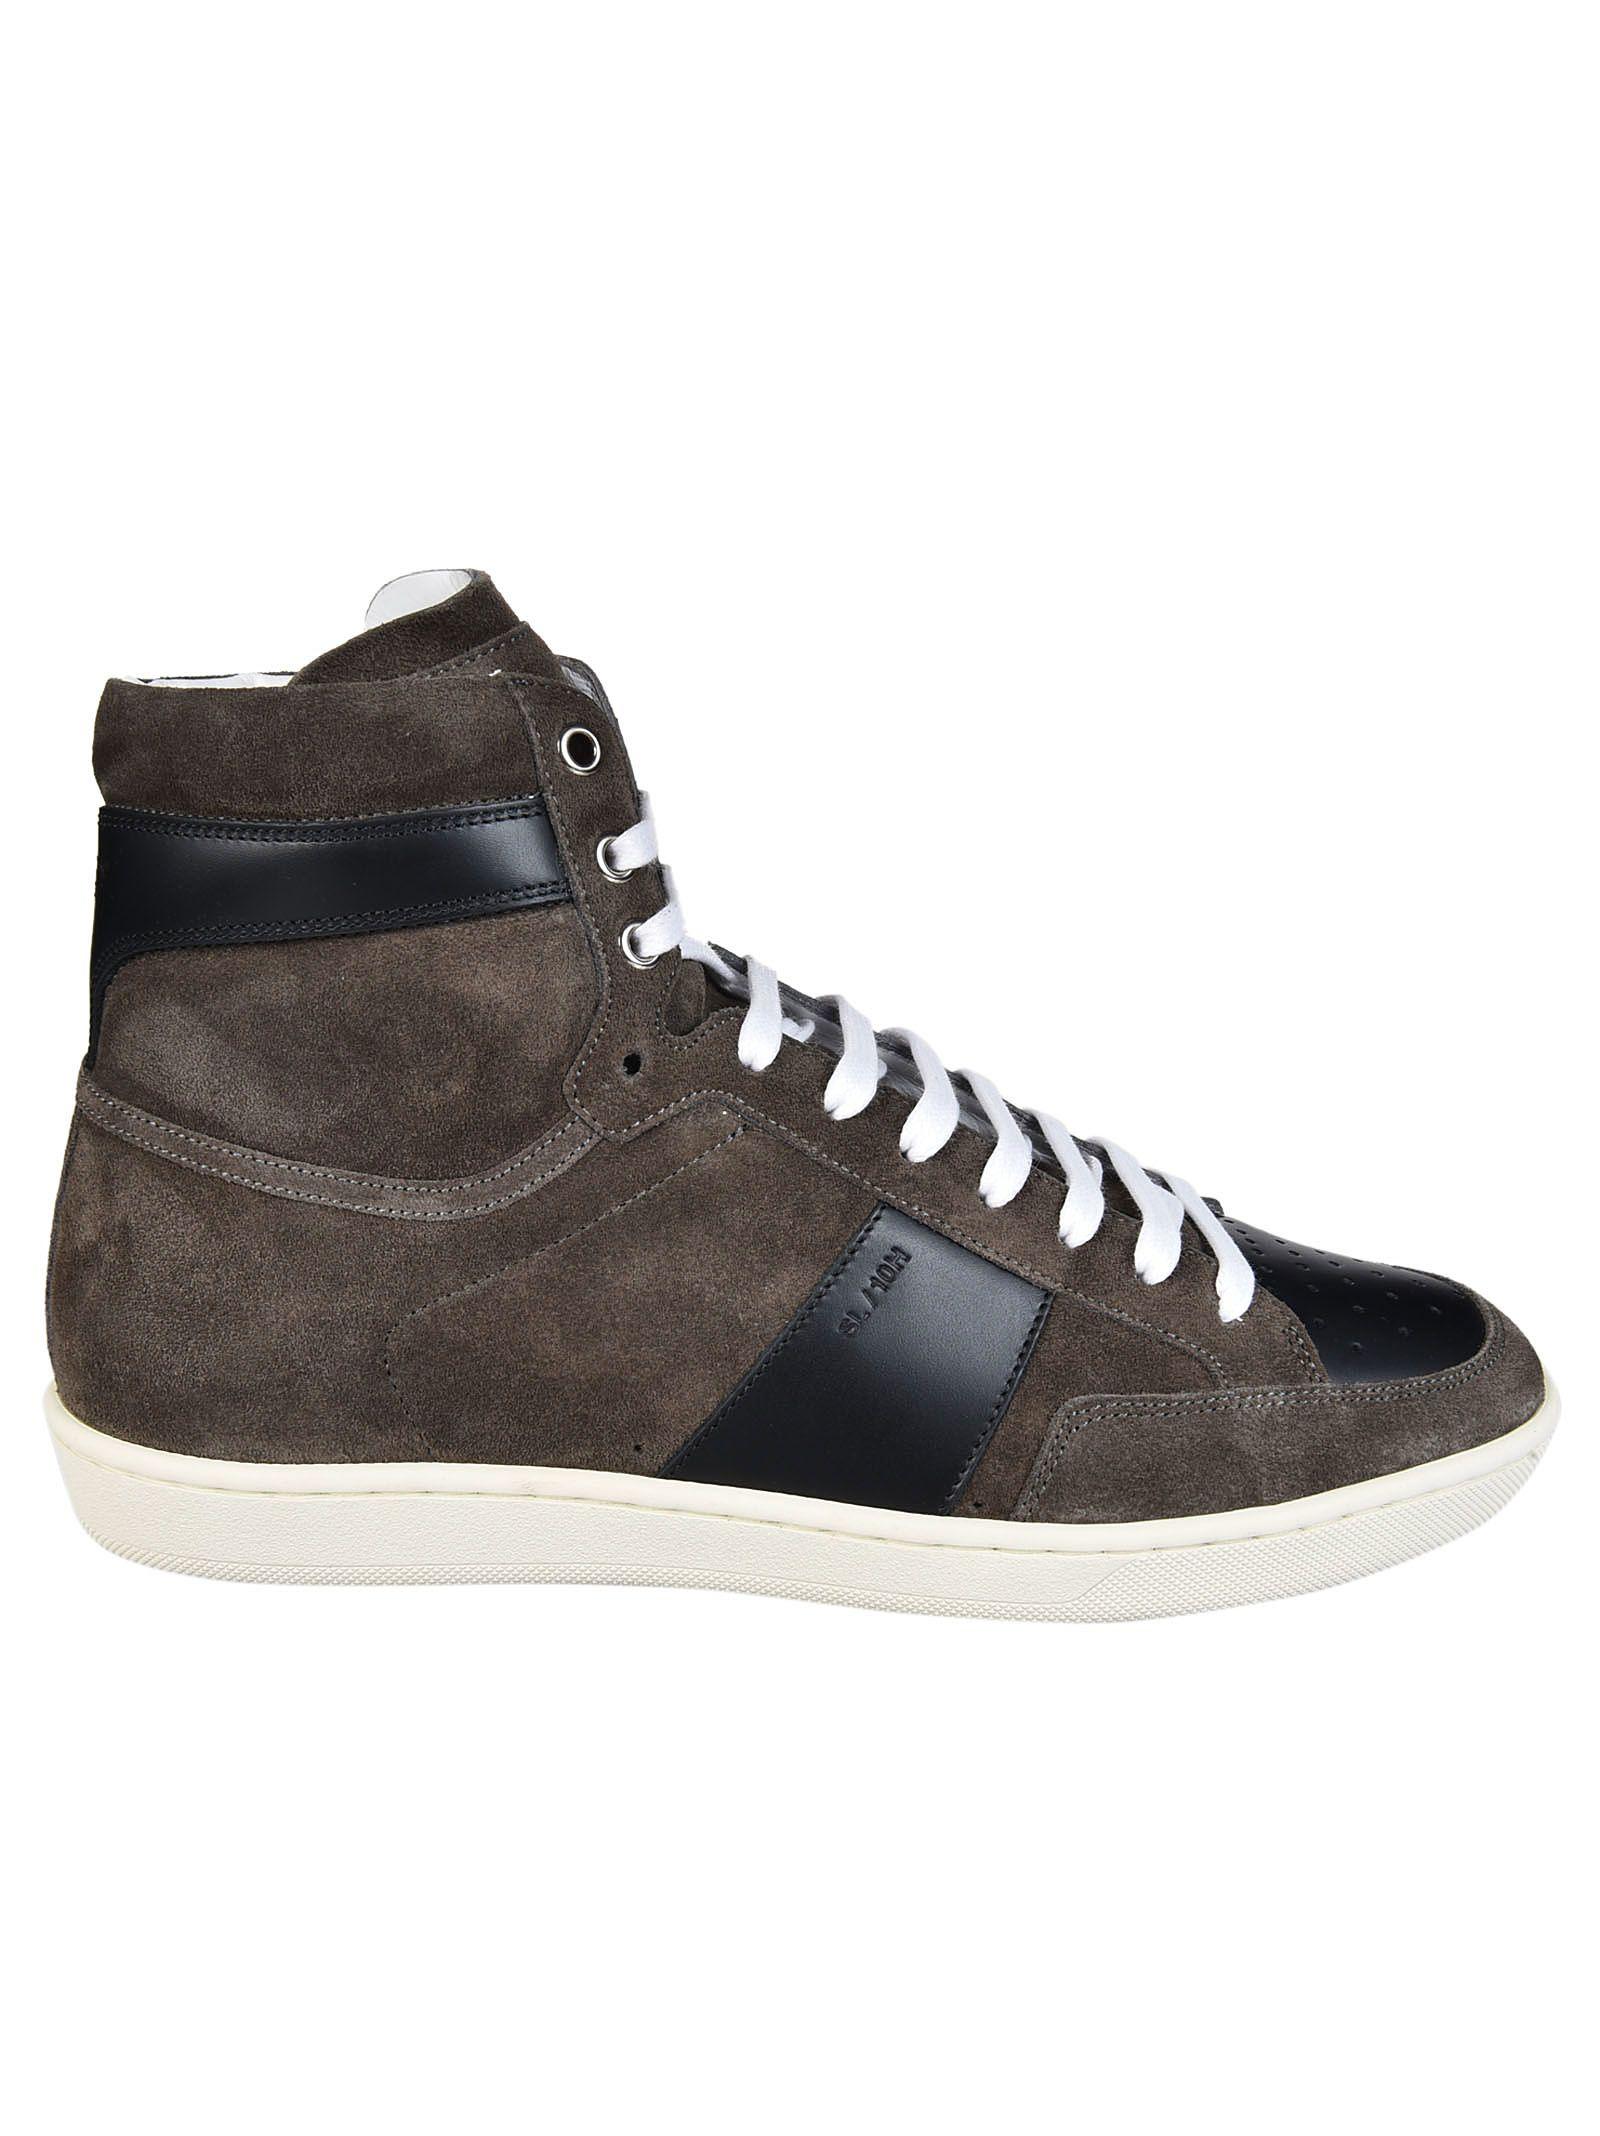 saint laurent saint laurent paris hi top sneakers brown men 39 s sneakers italist. Black Bedroom Furniture Sets. Home Design Ideas